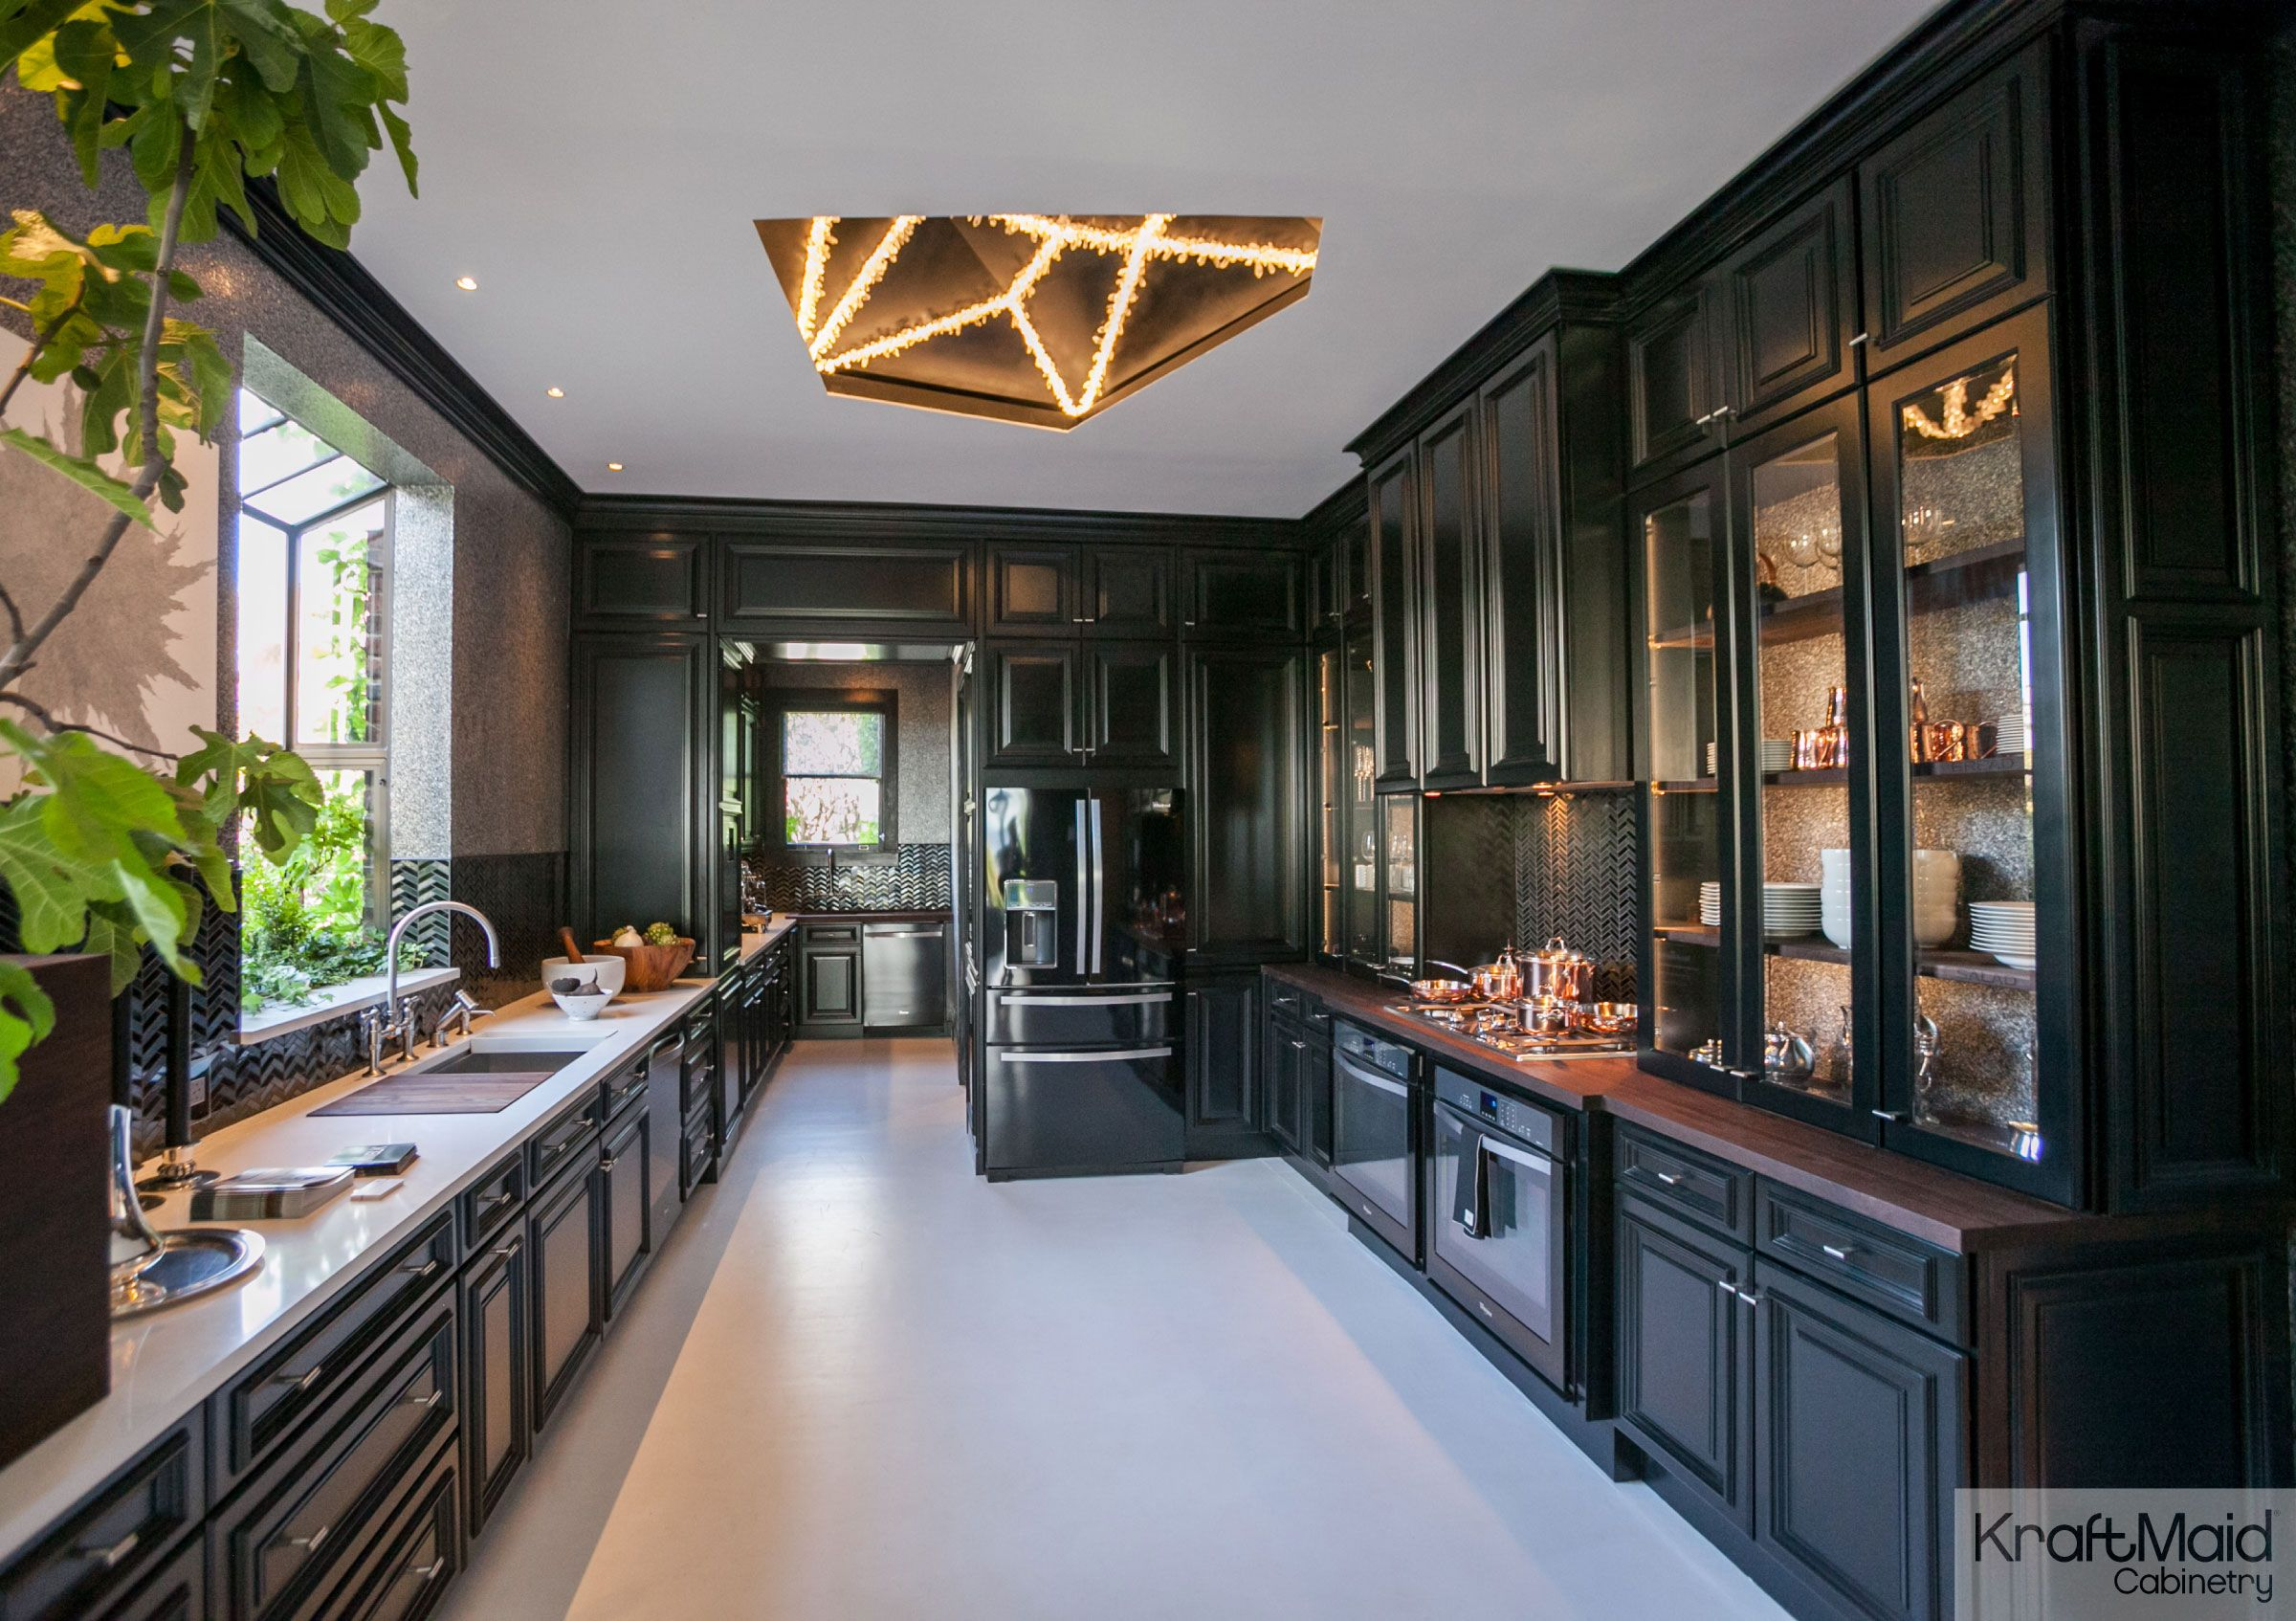 Video Kitchen Of The Year Designer S Vision Black Kitchens House Beautiful Kitchens Kraftmaid Kitchens